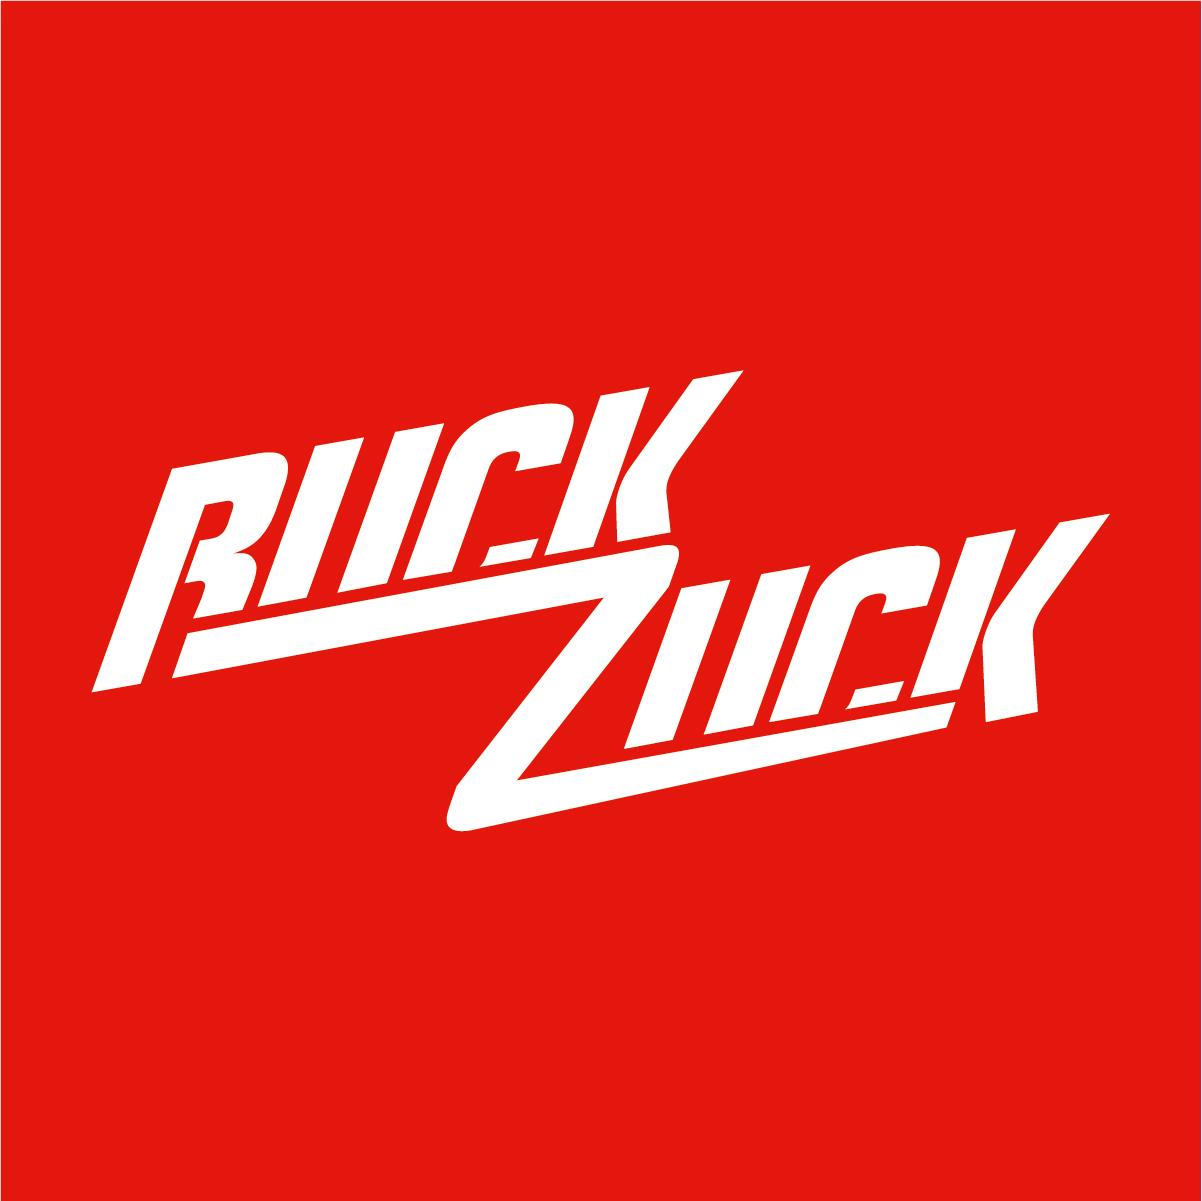 Komplettset Sono Pro Landscape Designboden 4,5mm Marrakesch